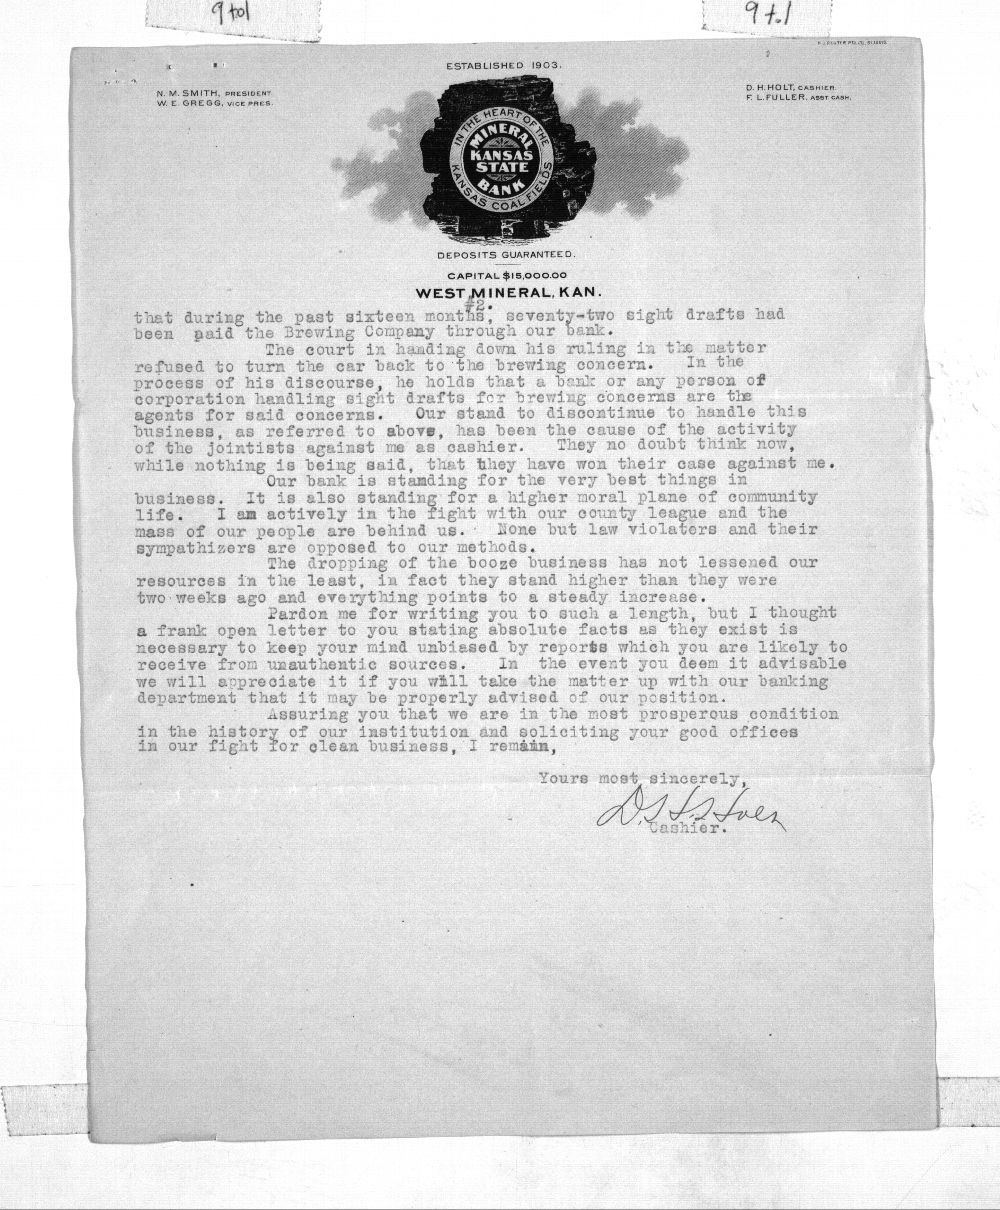 D. H. Holt to Governor George Hartshorn Hodges - 2